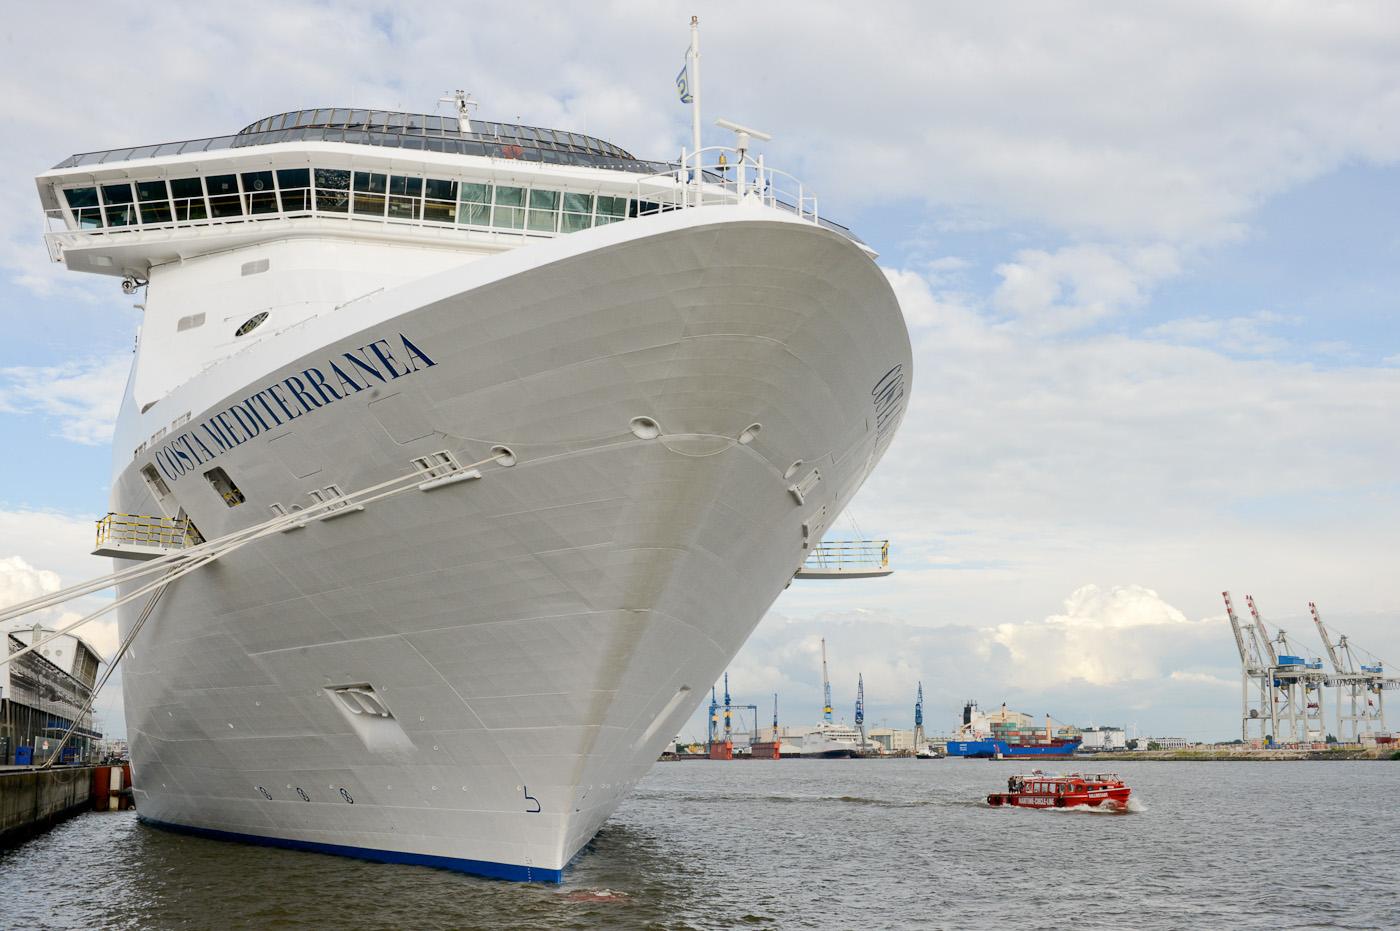 Foto ID 2014062907 Kreuzfahrtschiff Costa Mediterranea